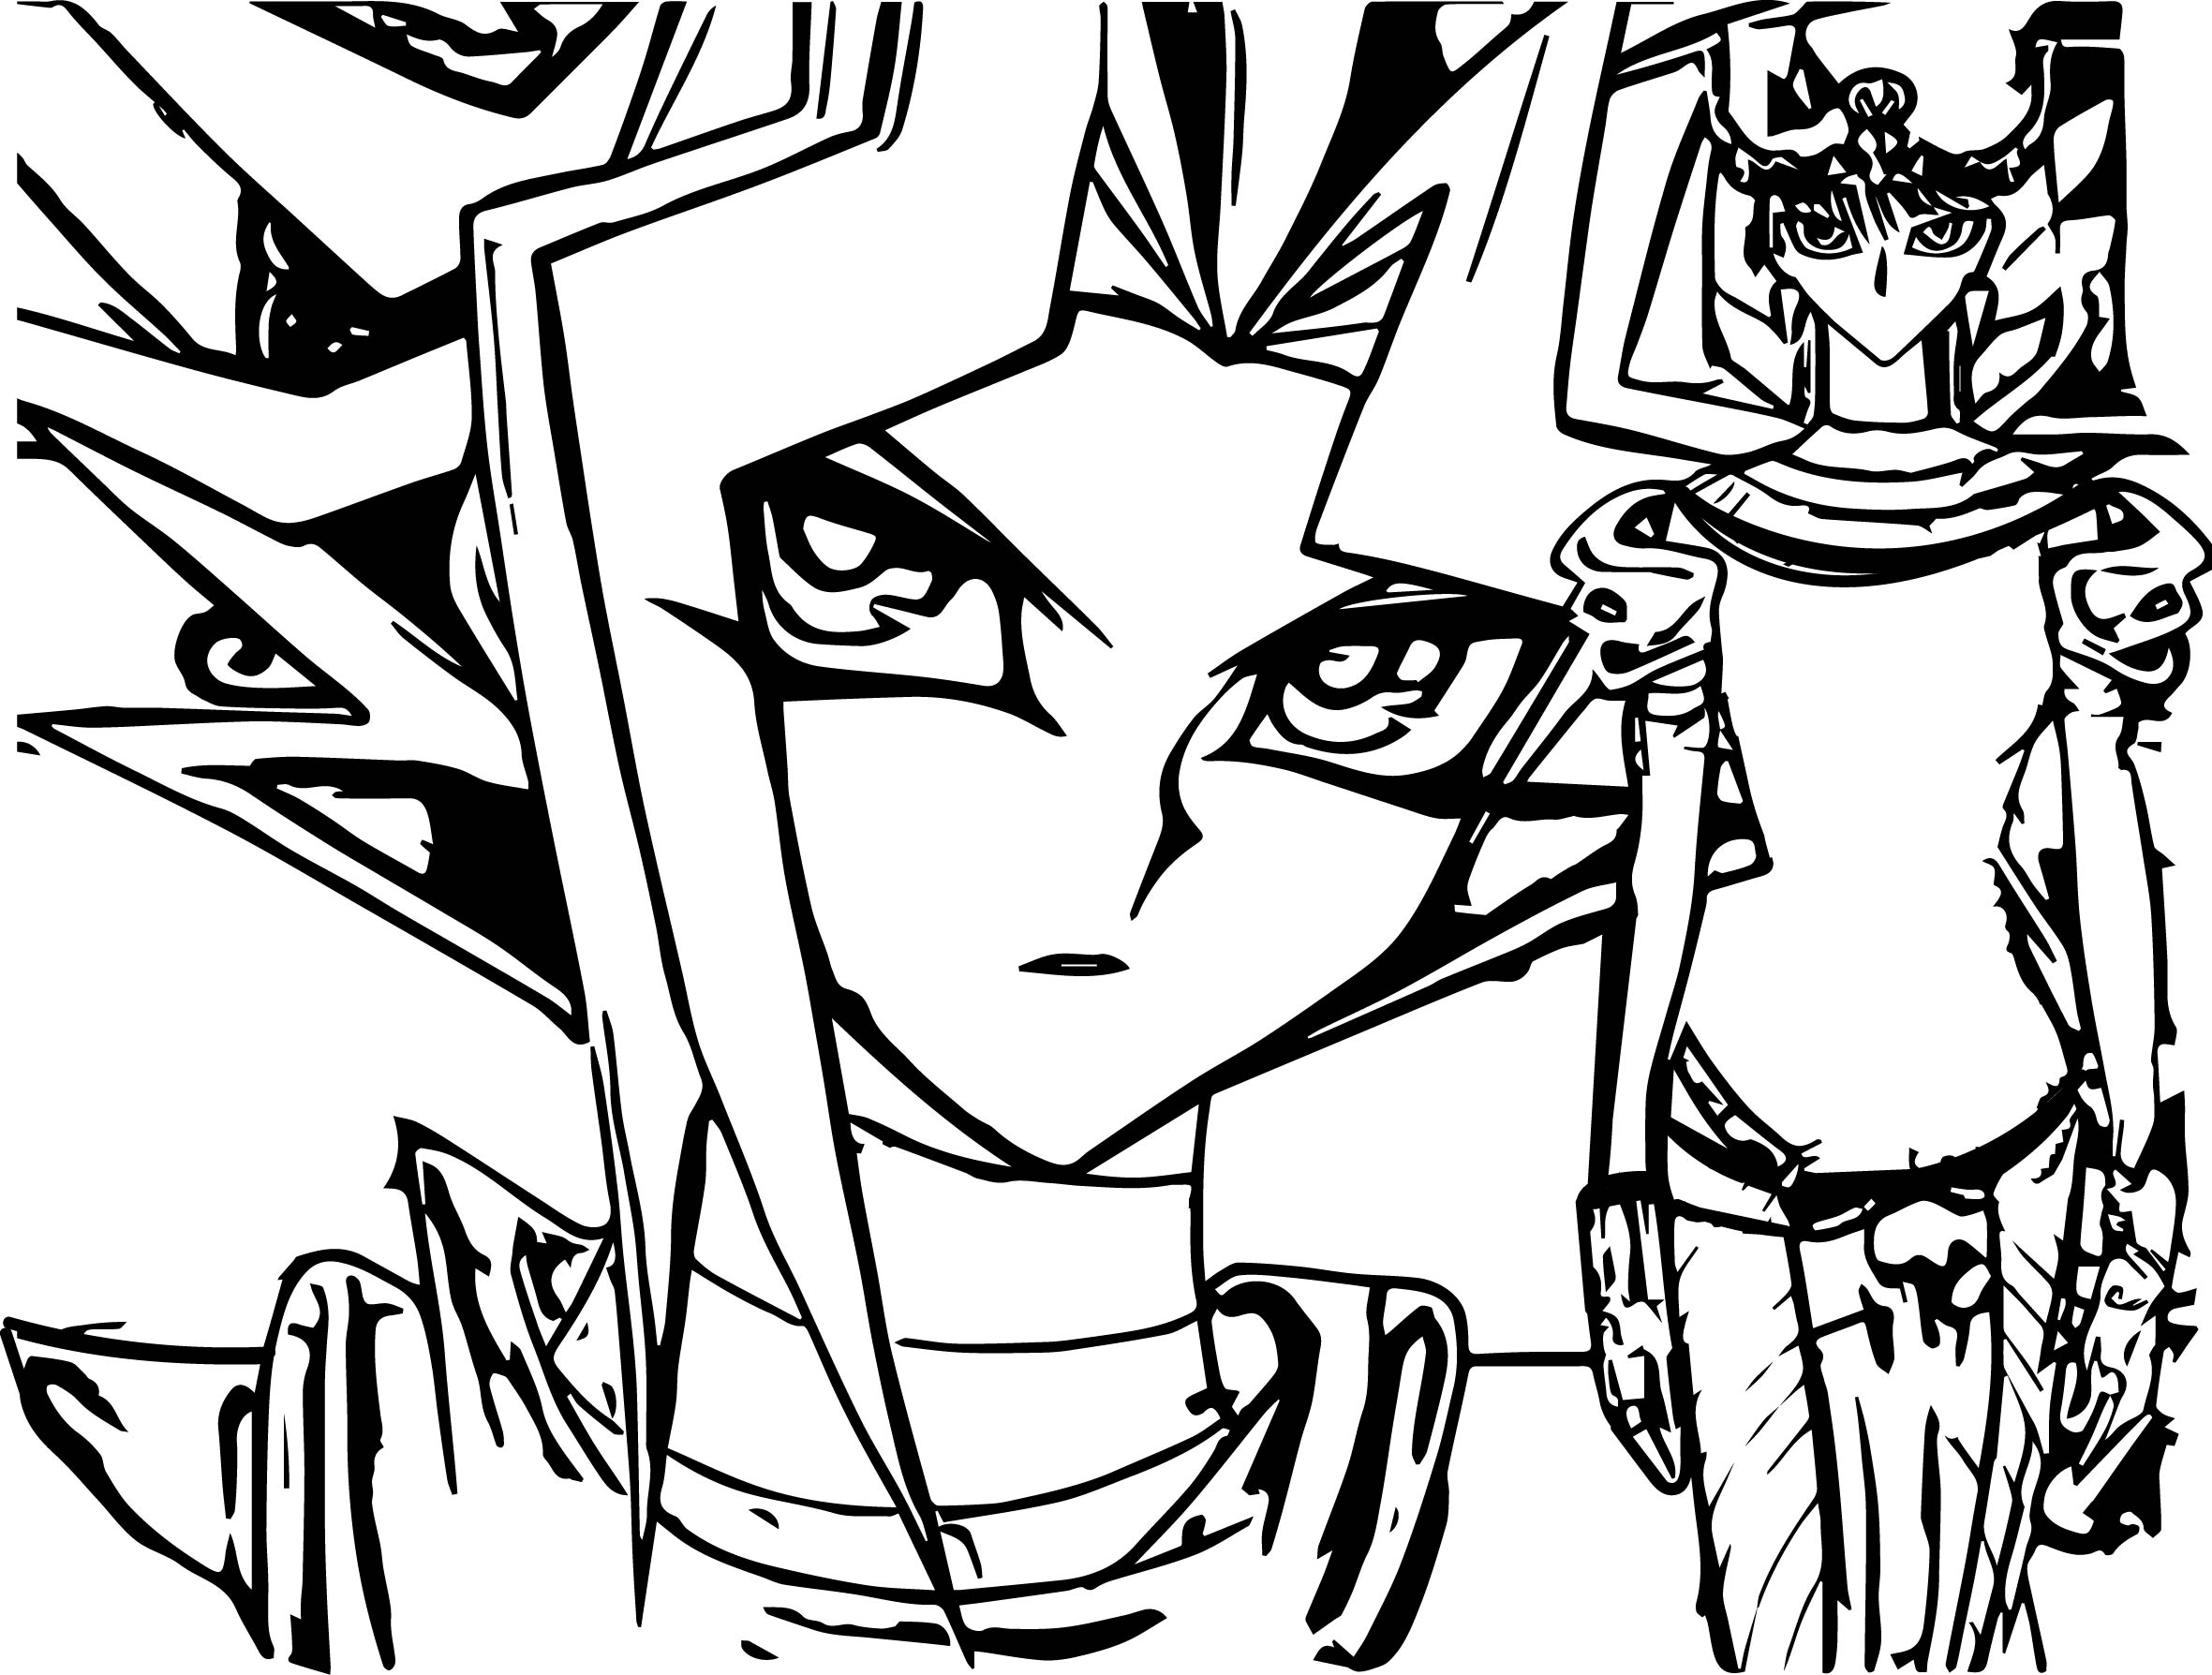 Yu Gi Oh Dreams Coloring Page